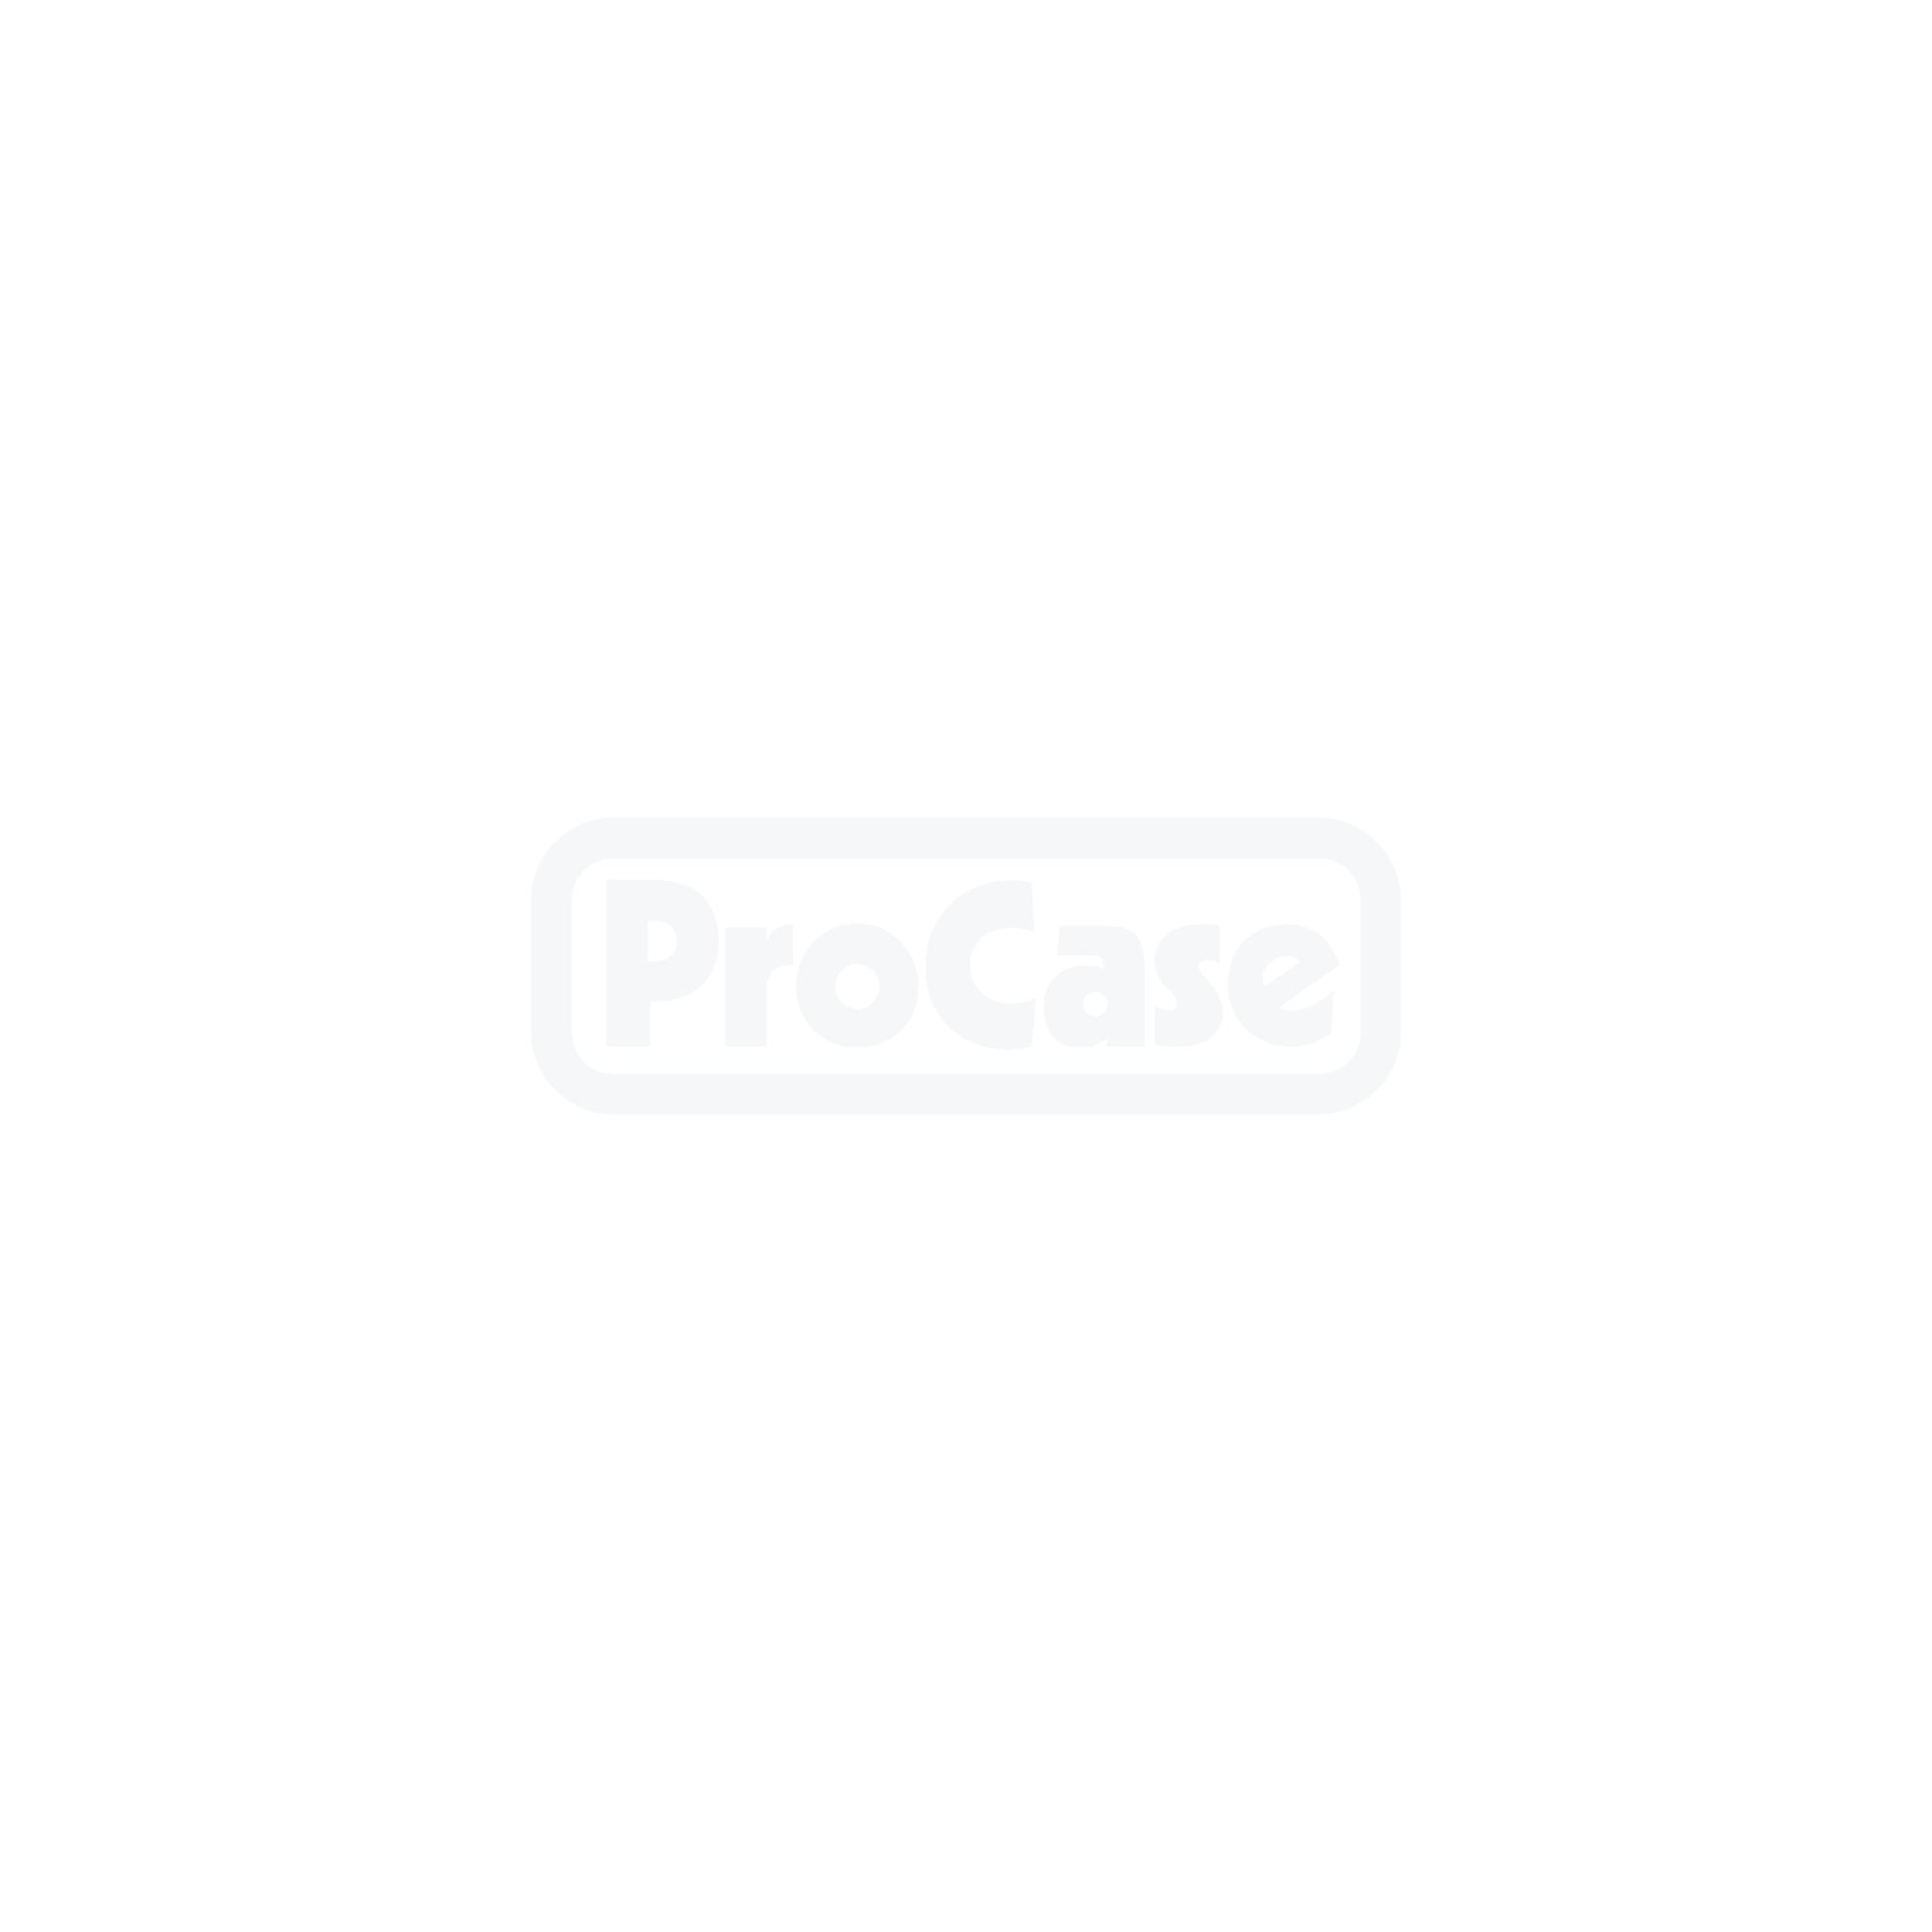 Flightcase für Berkel B3 / Profitec Nostalgia 300 Standfuß 3